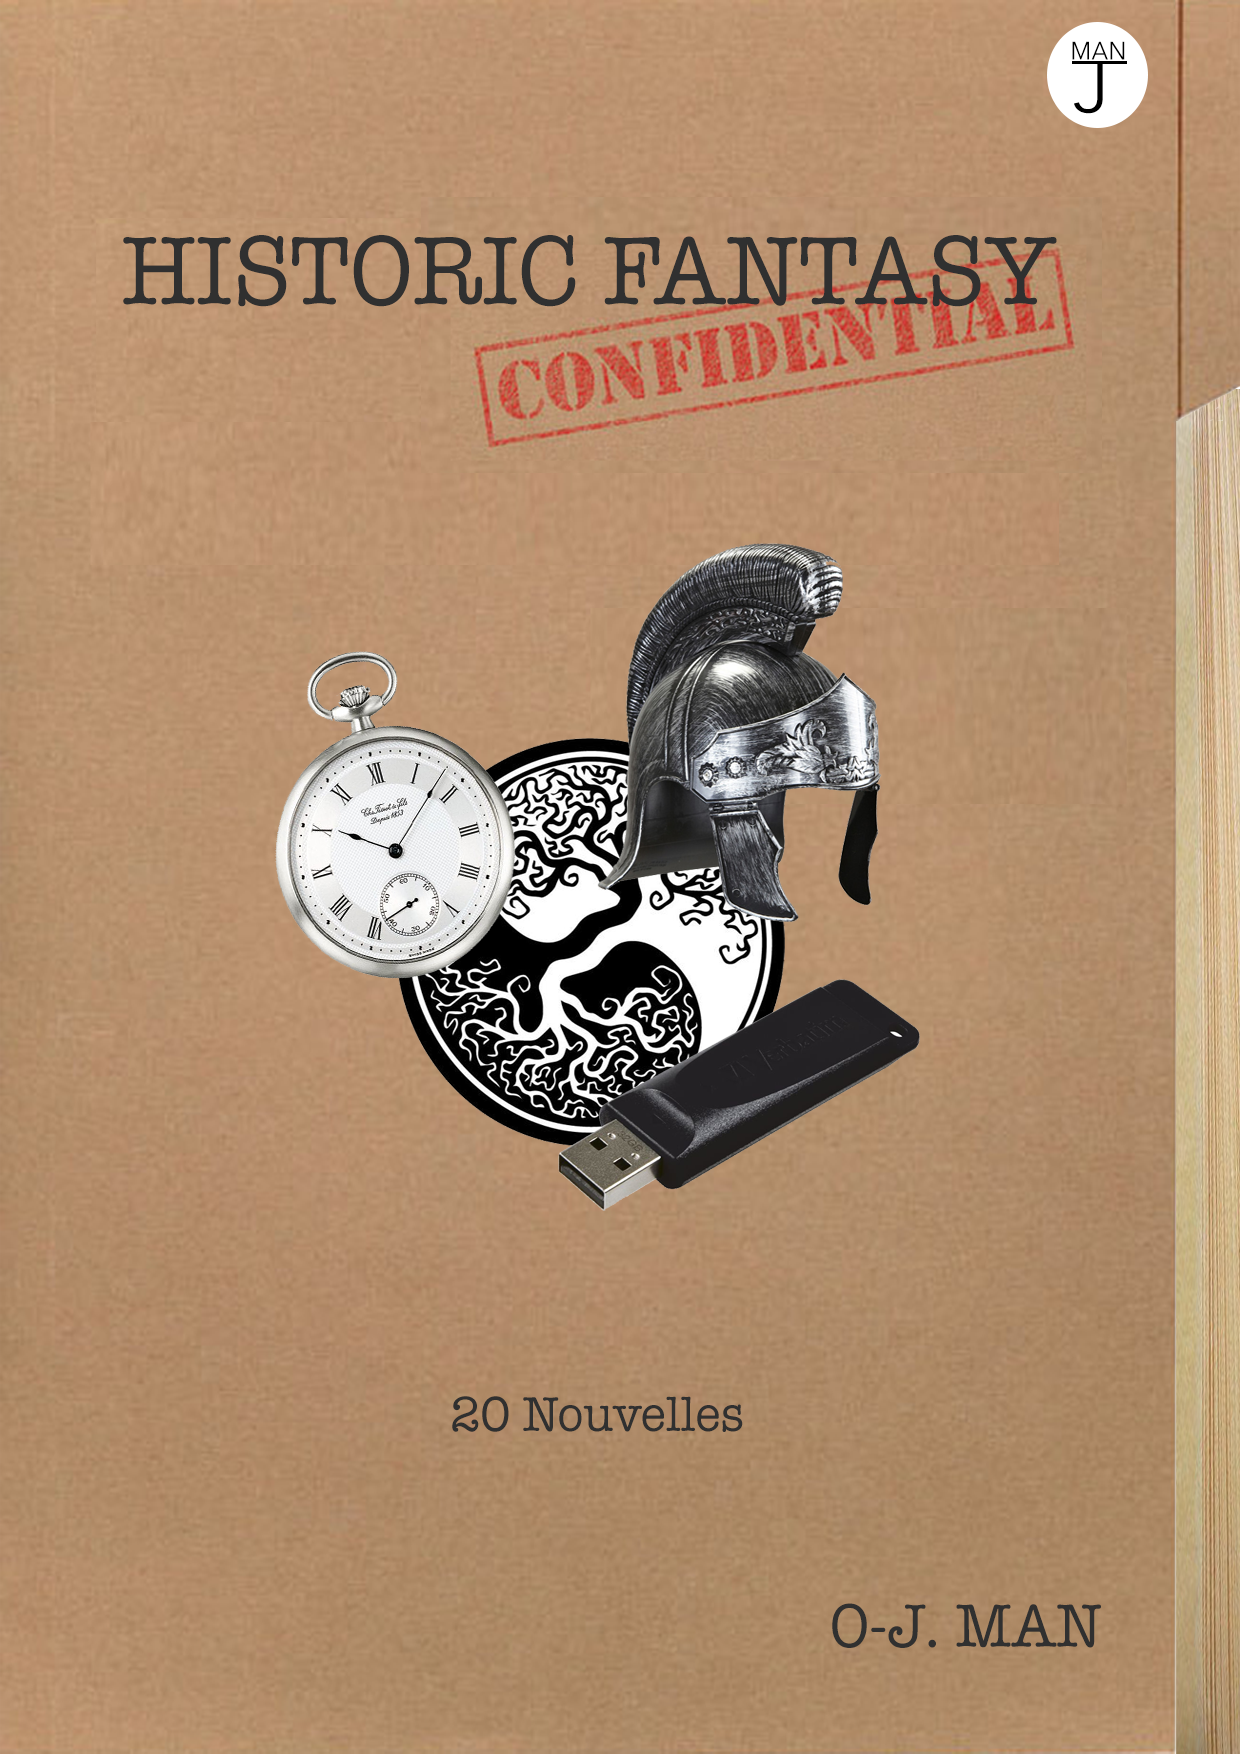 ojman-historic-fantasy